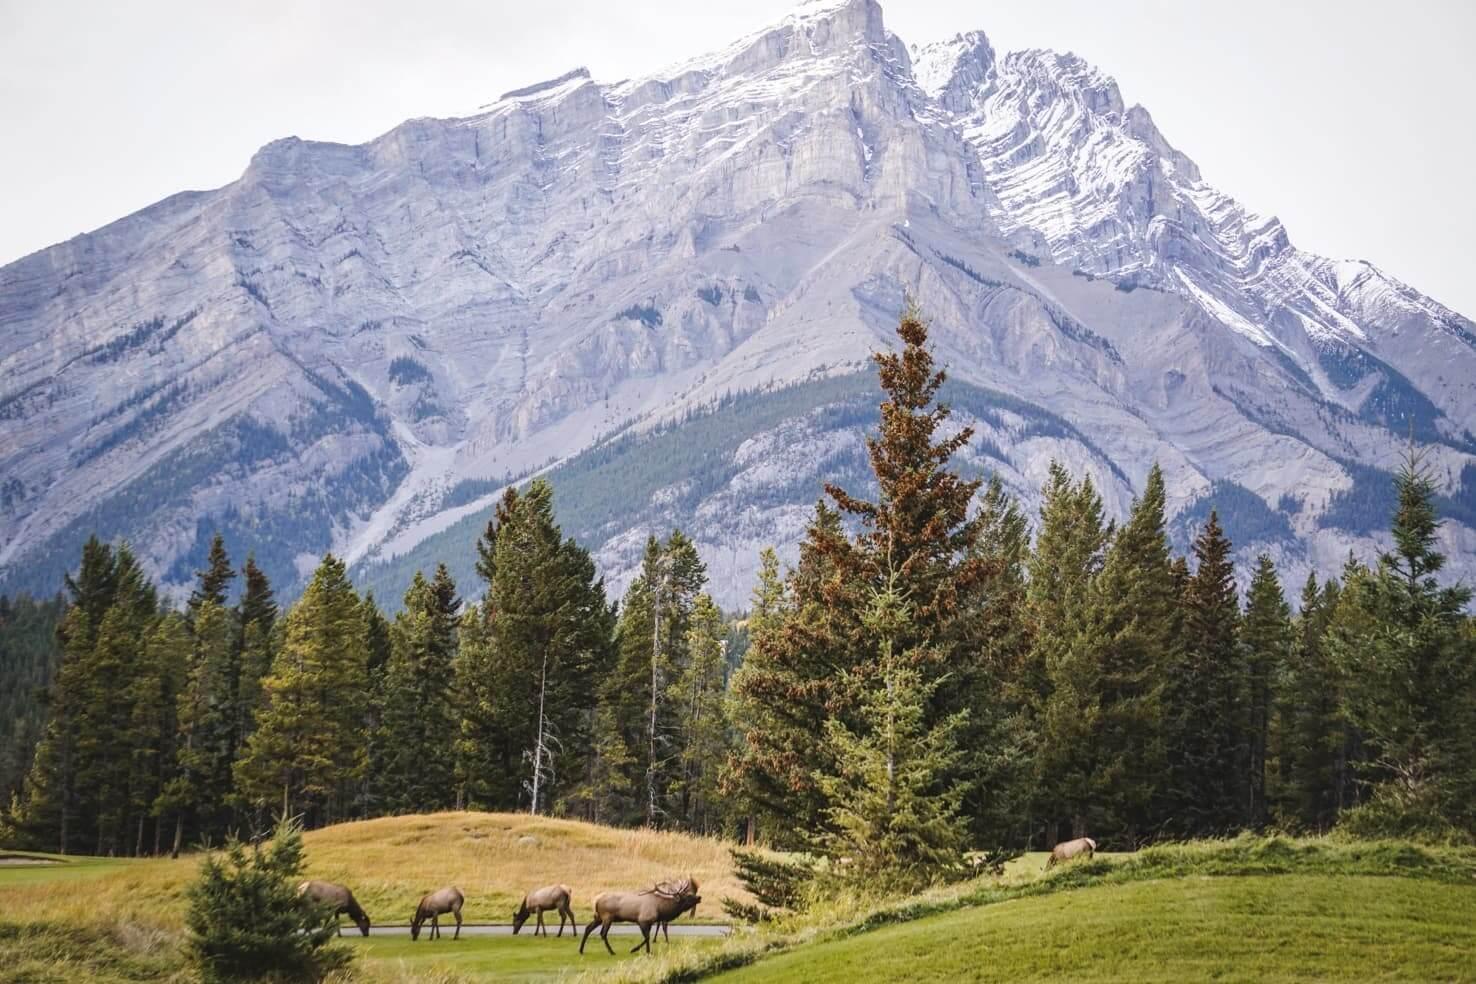 Canadian Rockies road trip itinerary - Banff National Park